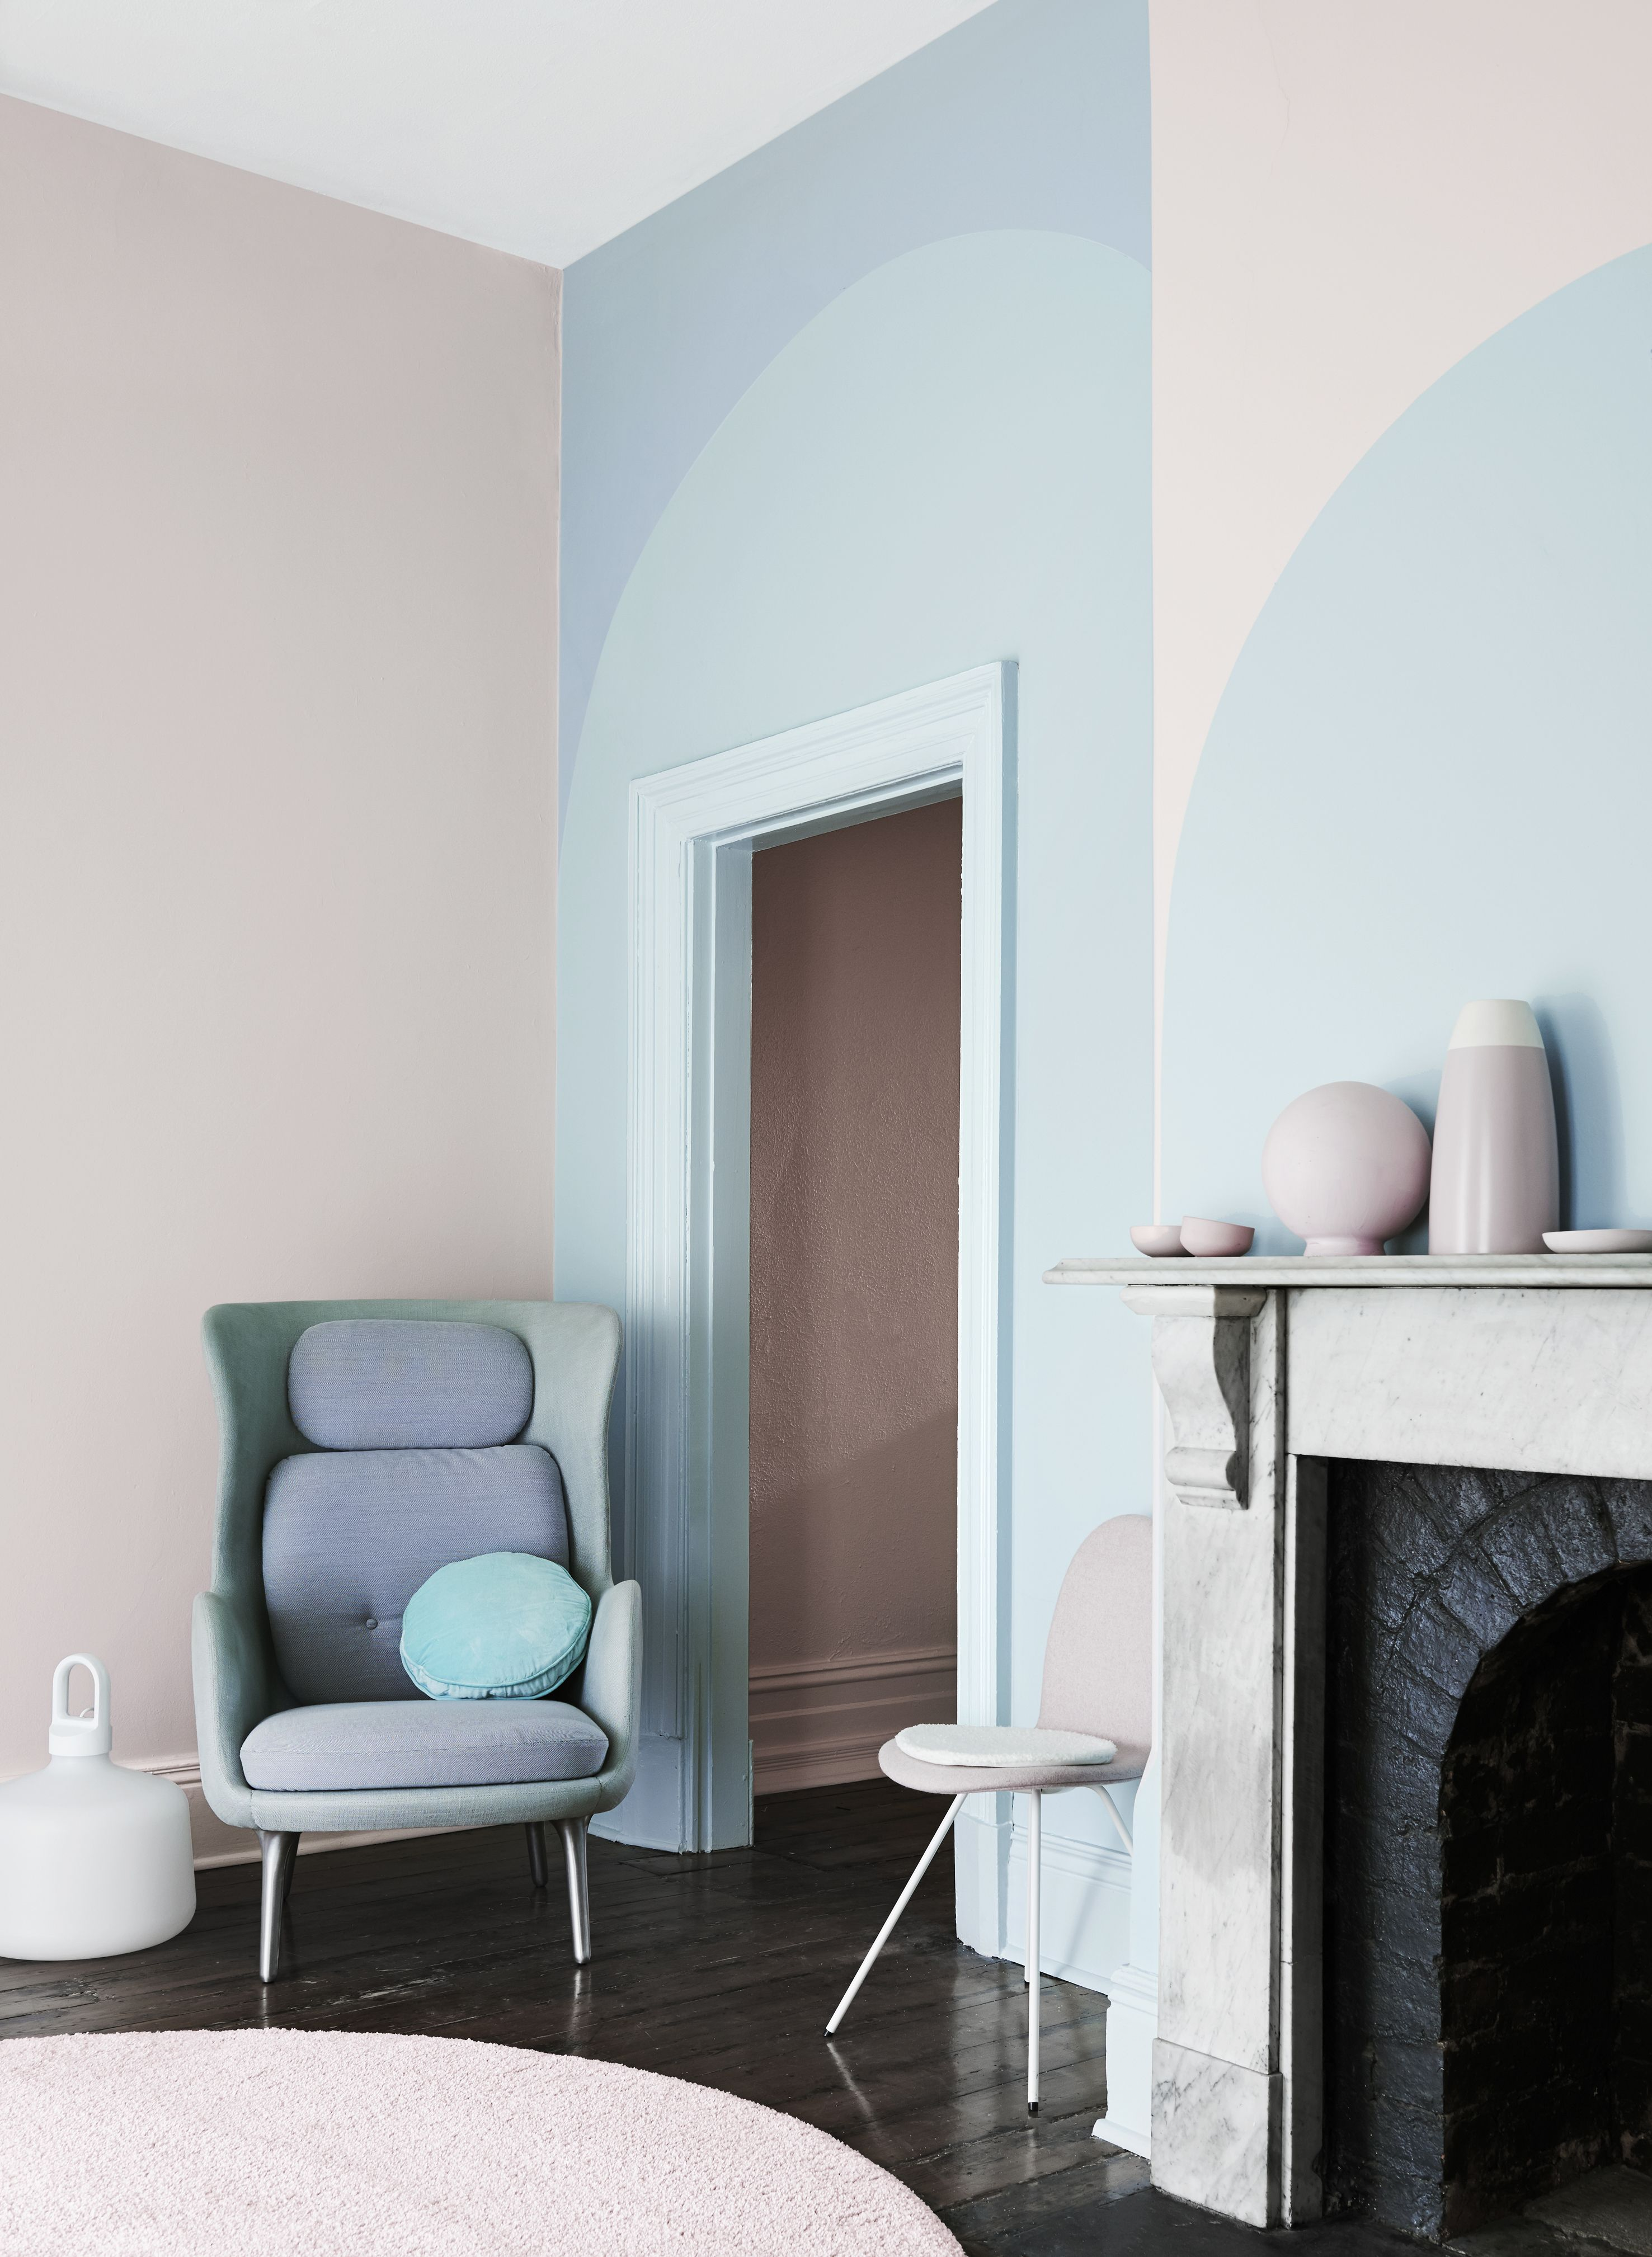 Silent Shift Get The Look Dulux Paints Salmongrey Filippa Pinkmarble Decor Interior Room Decor